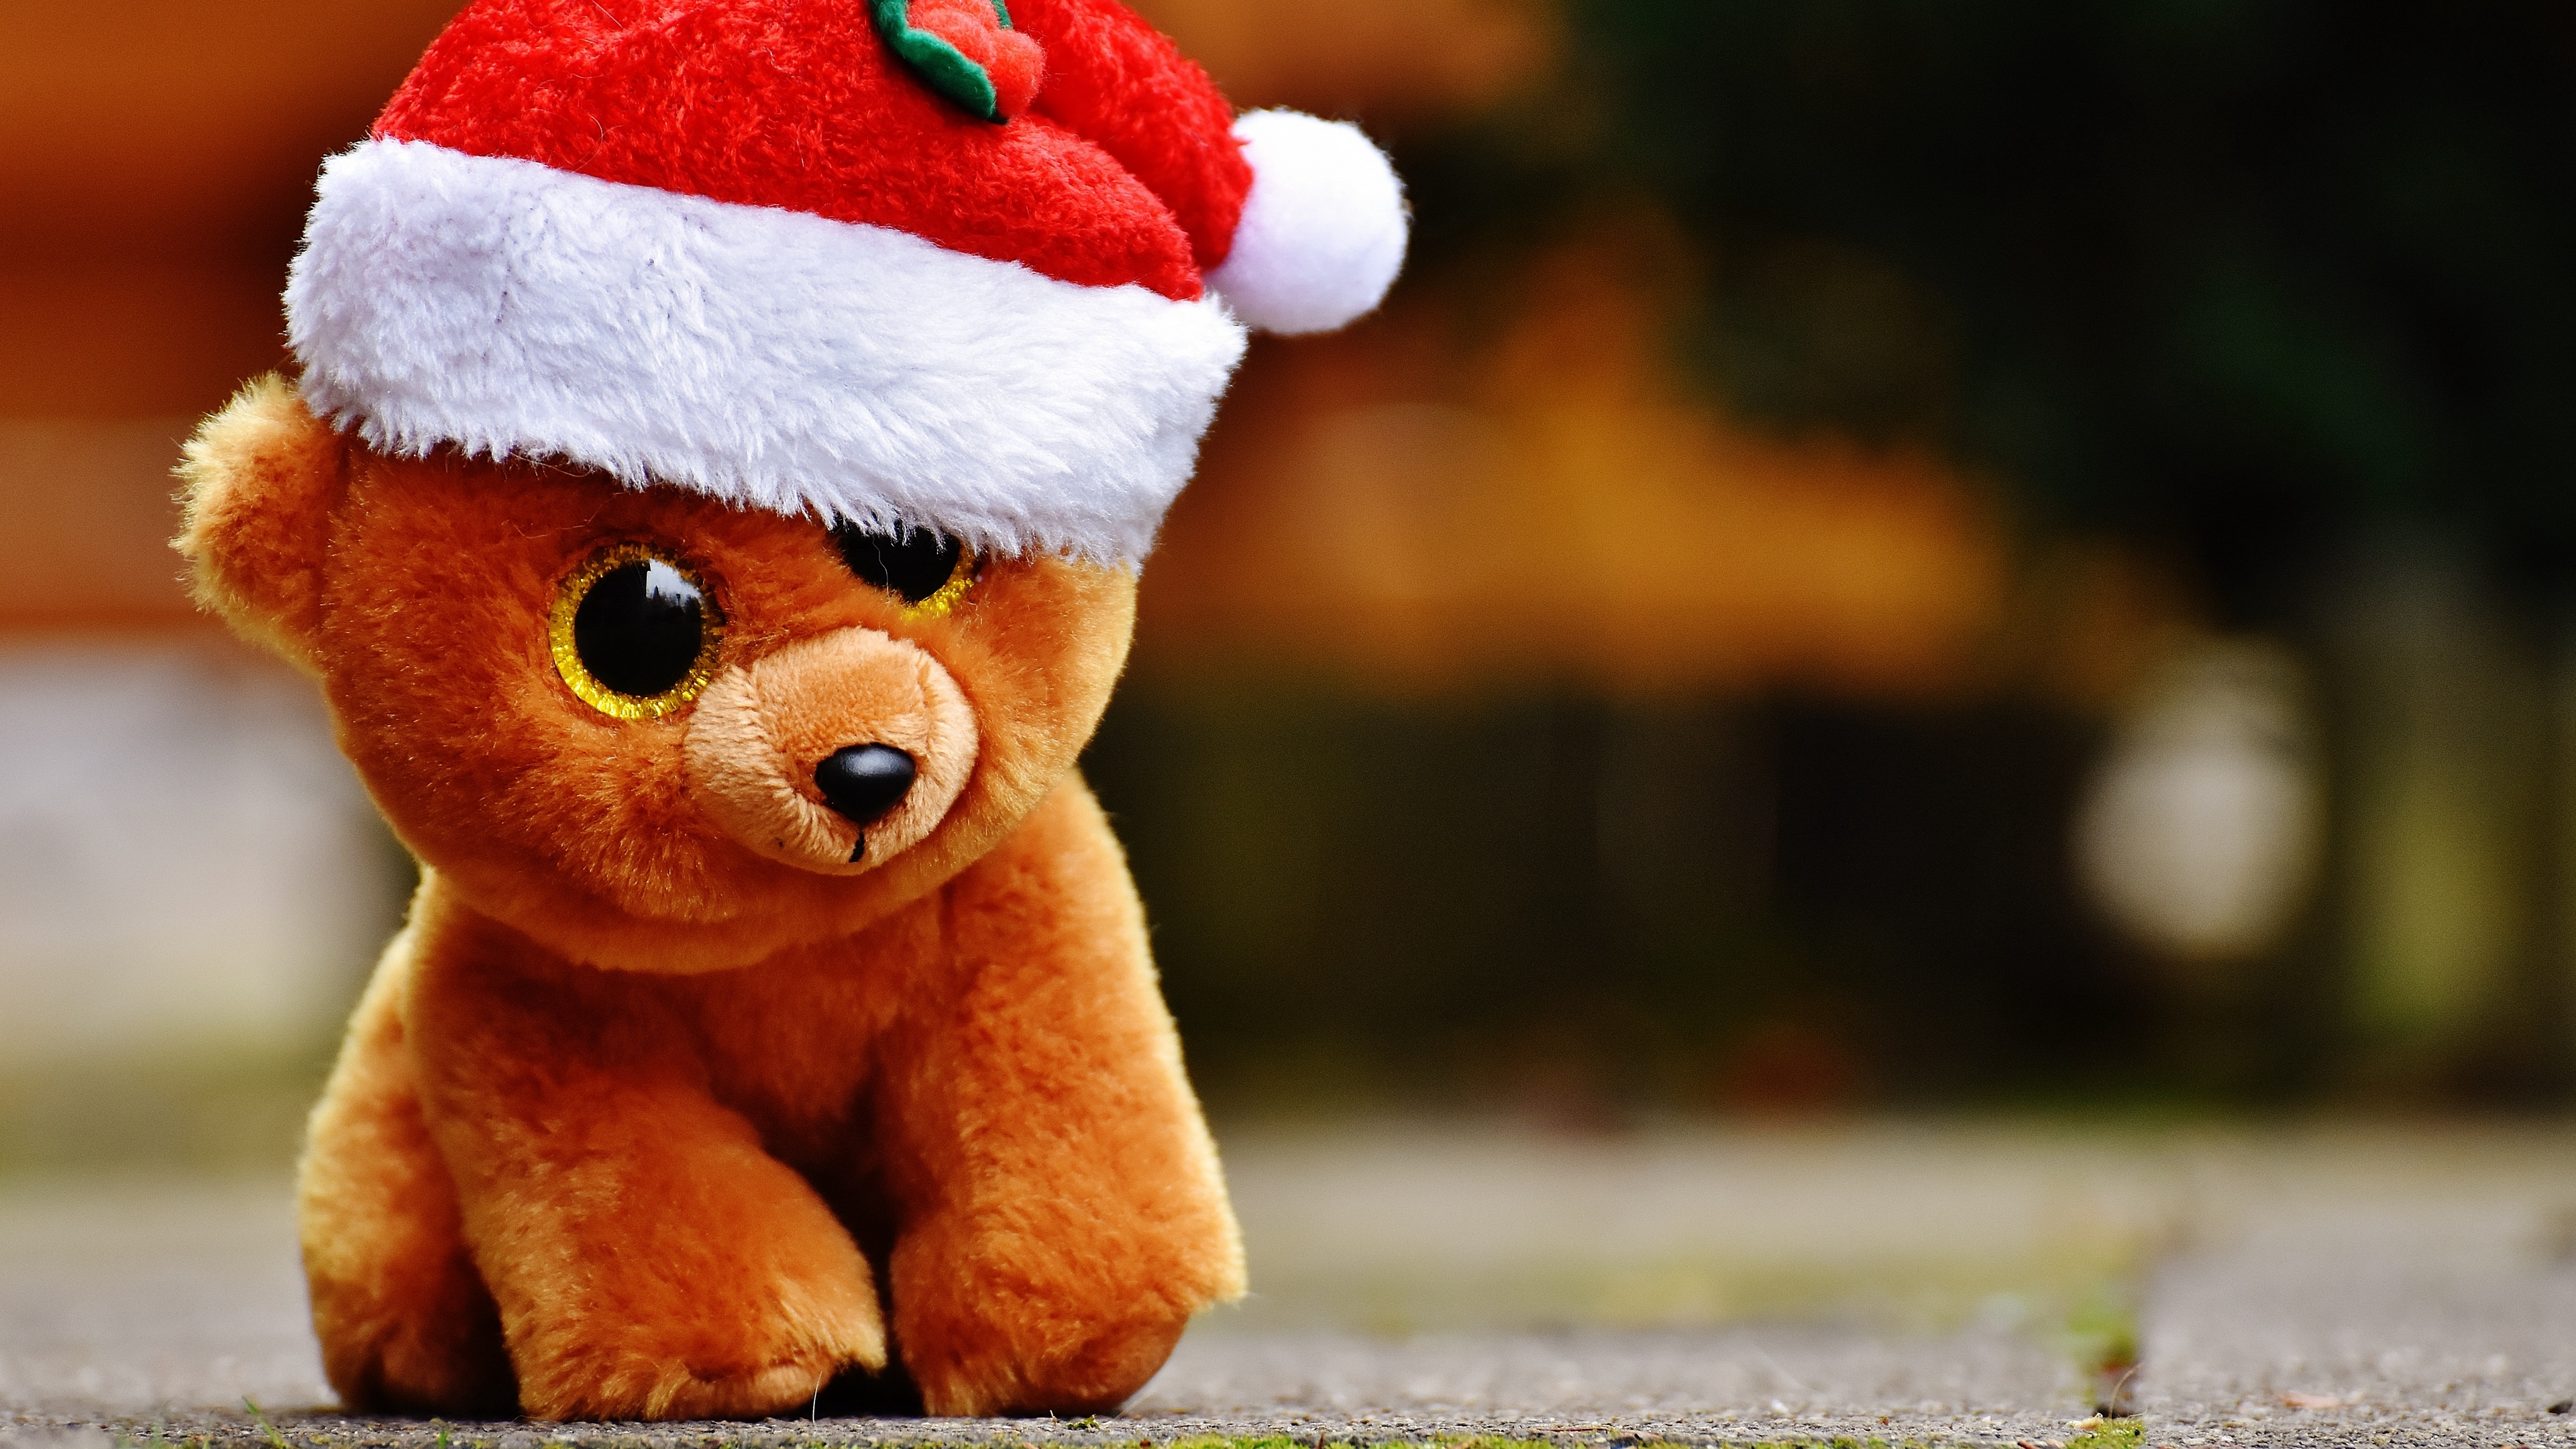 toy teddy bear christmas 4k 1538344962 - toy, teddy bear, christmas 4k - toy, teddy bear, Christmas